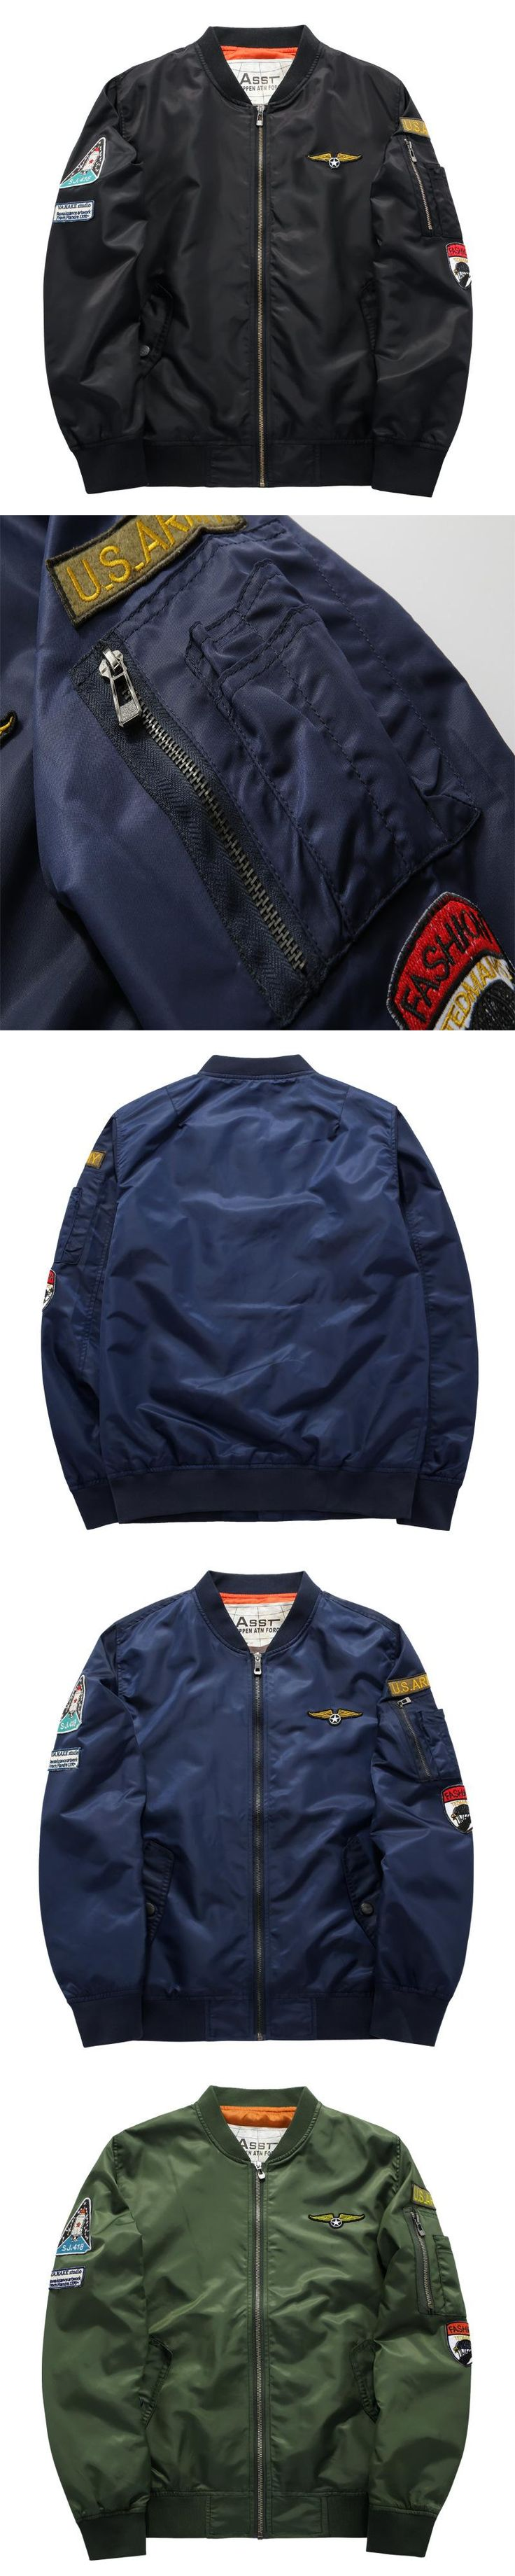 Brand Mens Jackets And Coats Tactical Gear Softshell Jacket Men Army Waterproof Camo Bomber Jacket Windbreaker Military Jackets